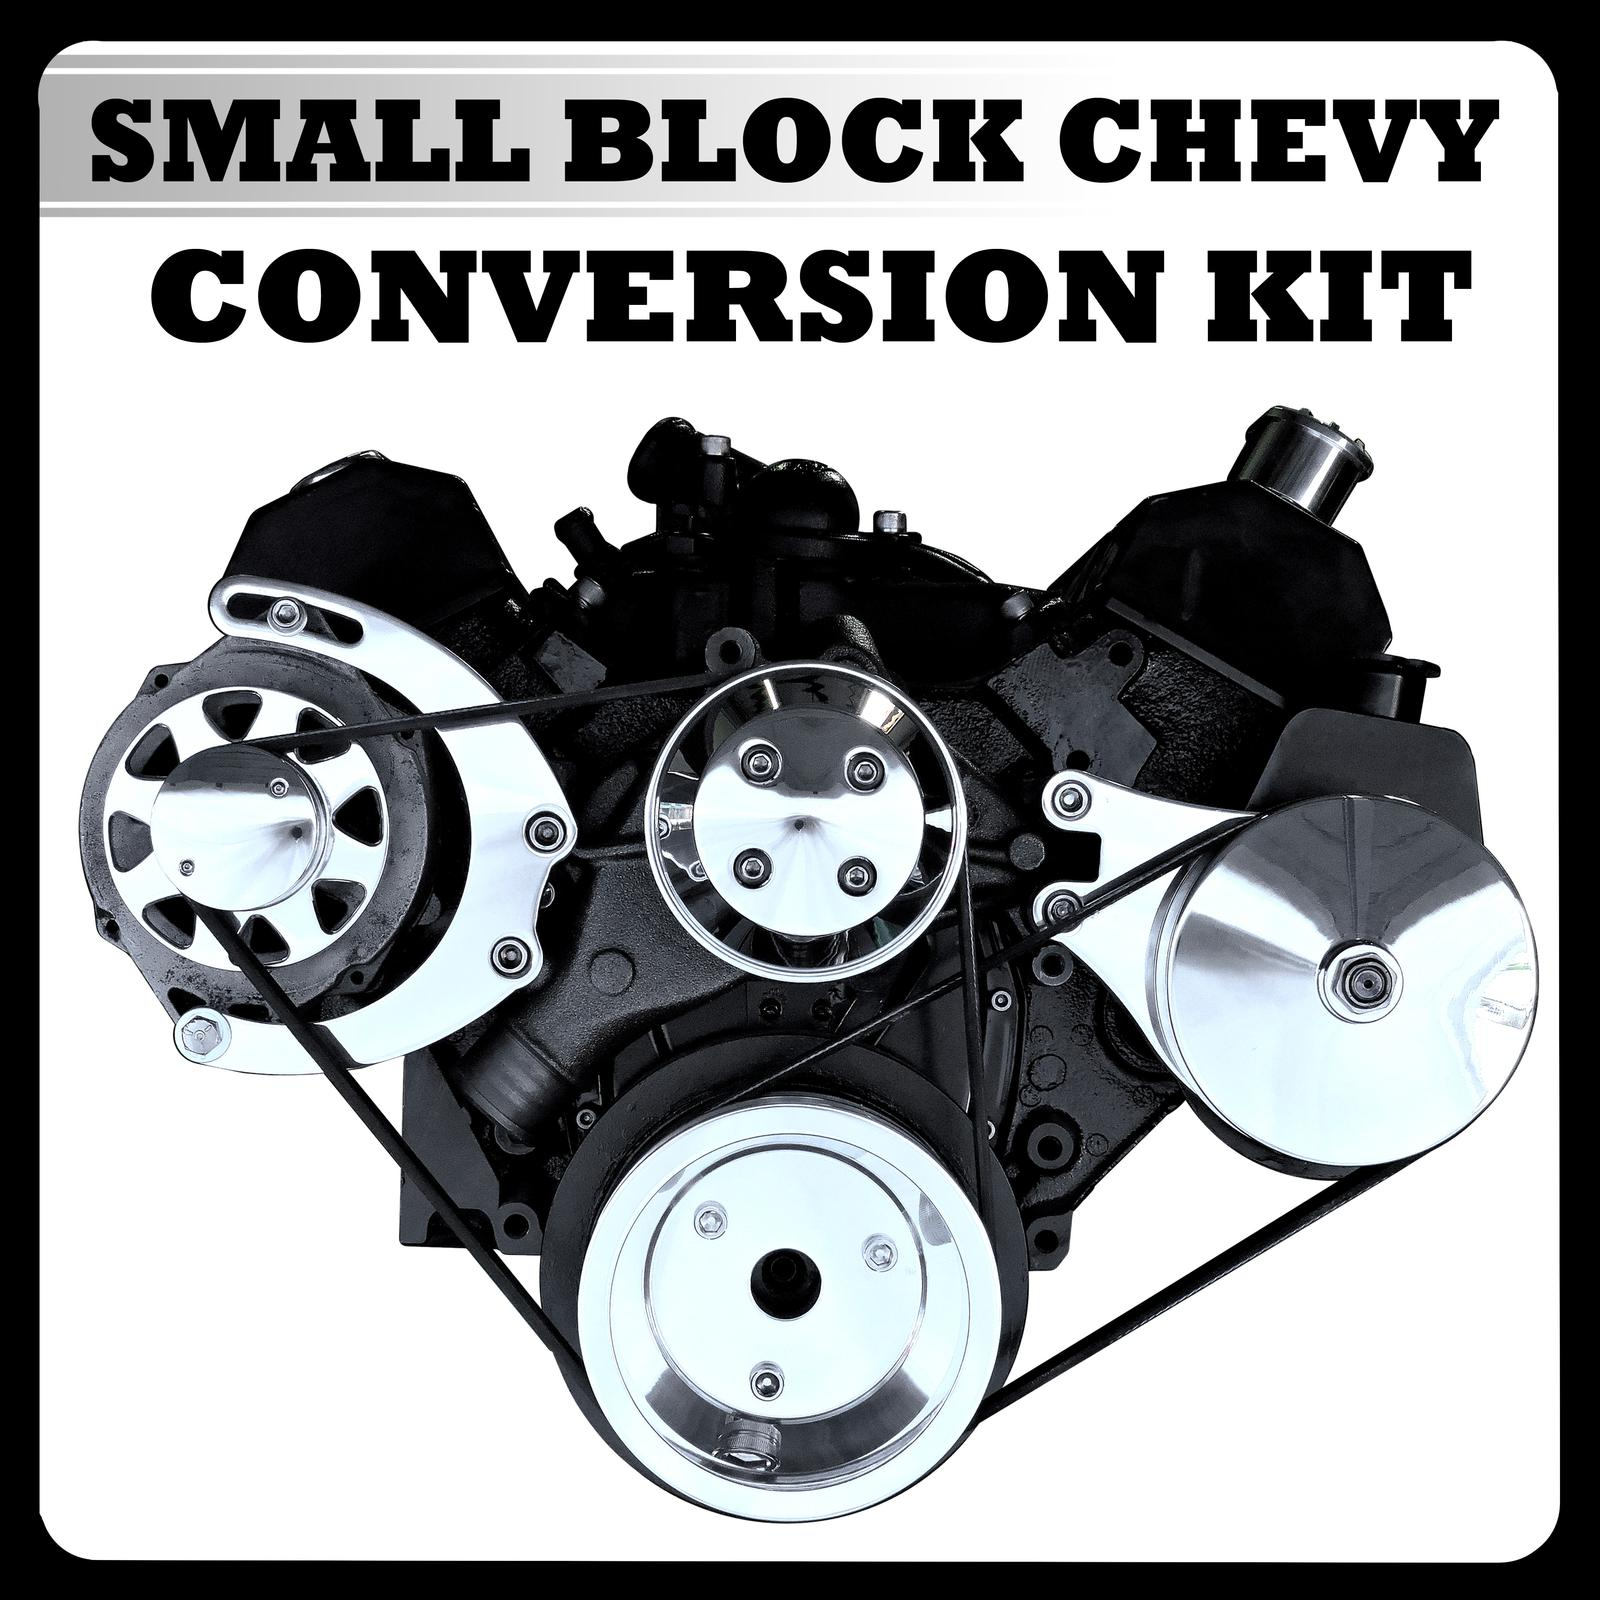 Catalog Cover - Serpentine Converstion Kit